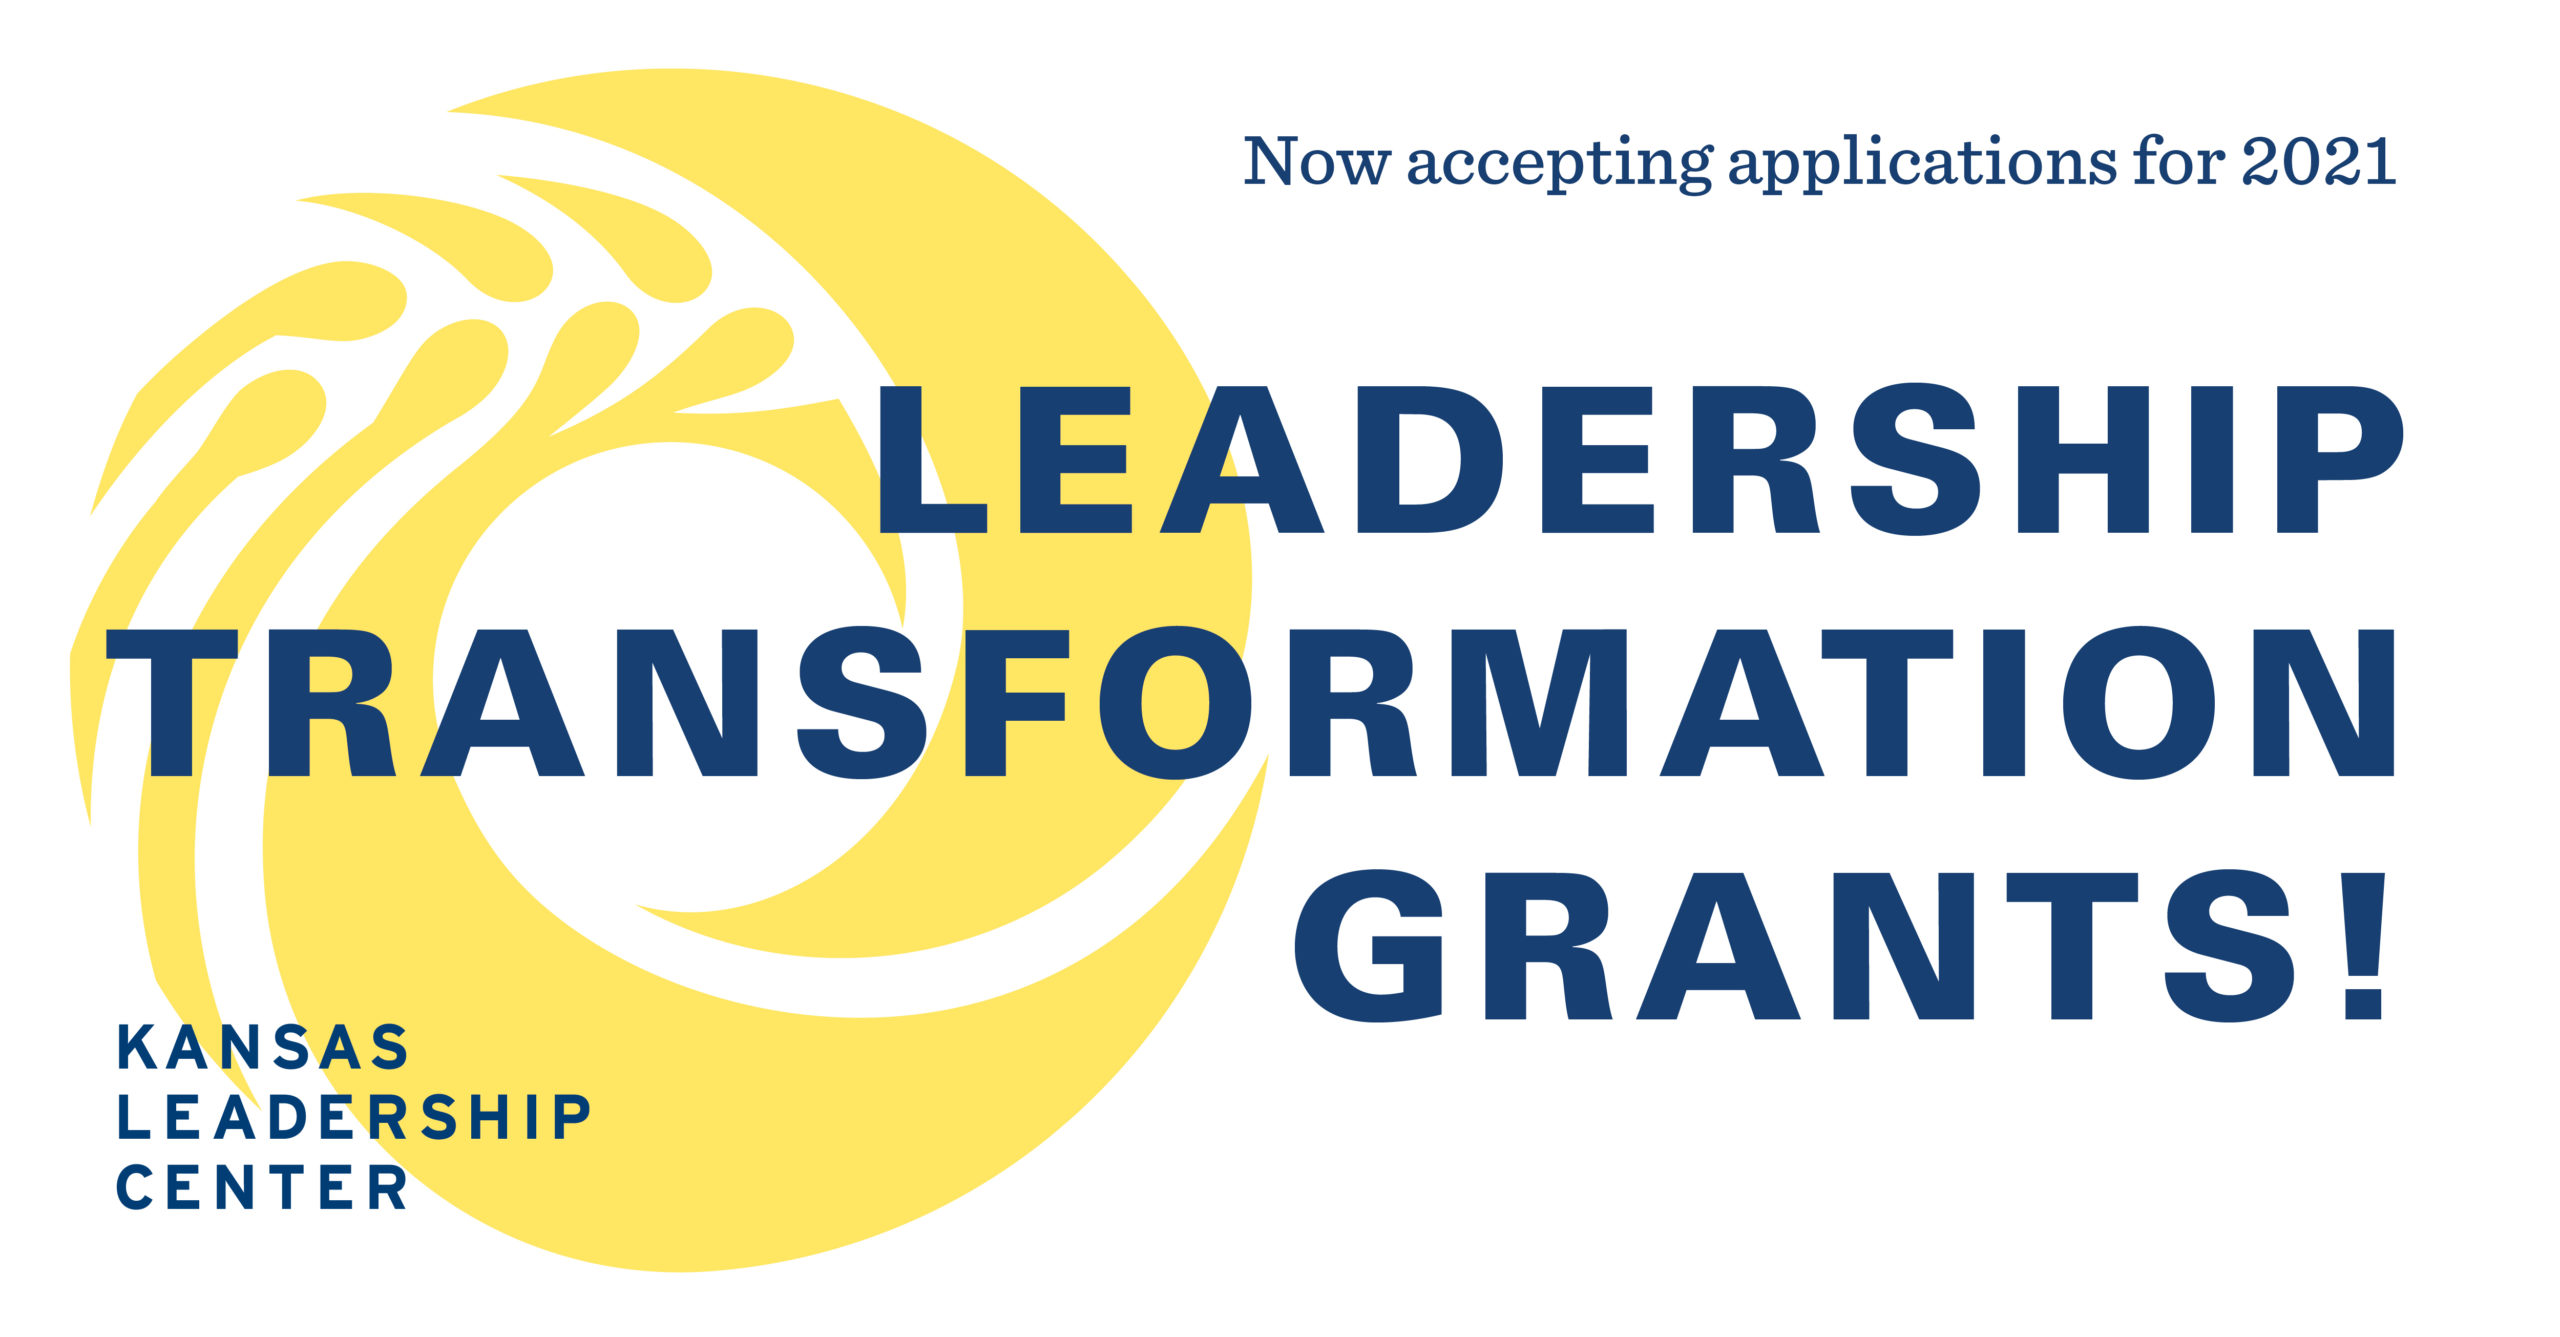 Transformation Grants